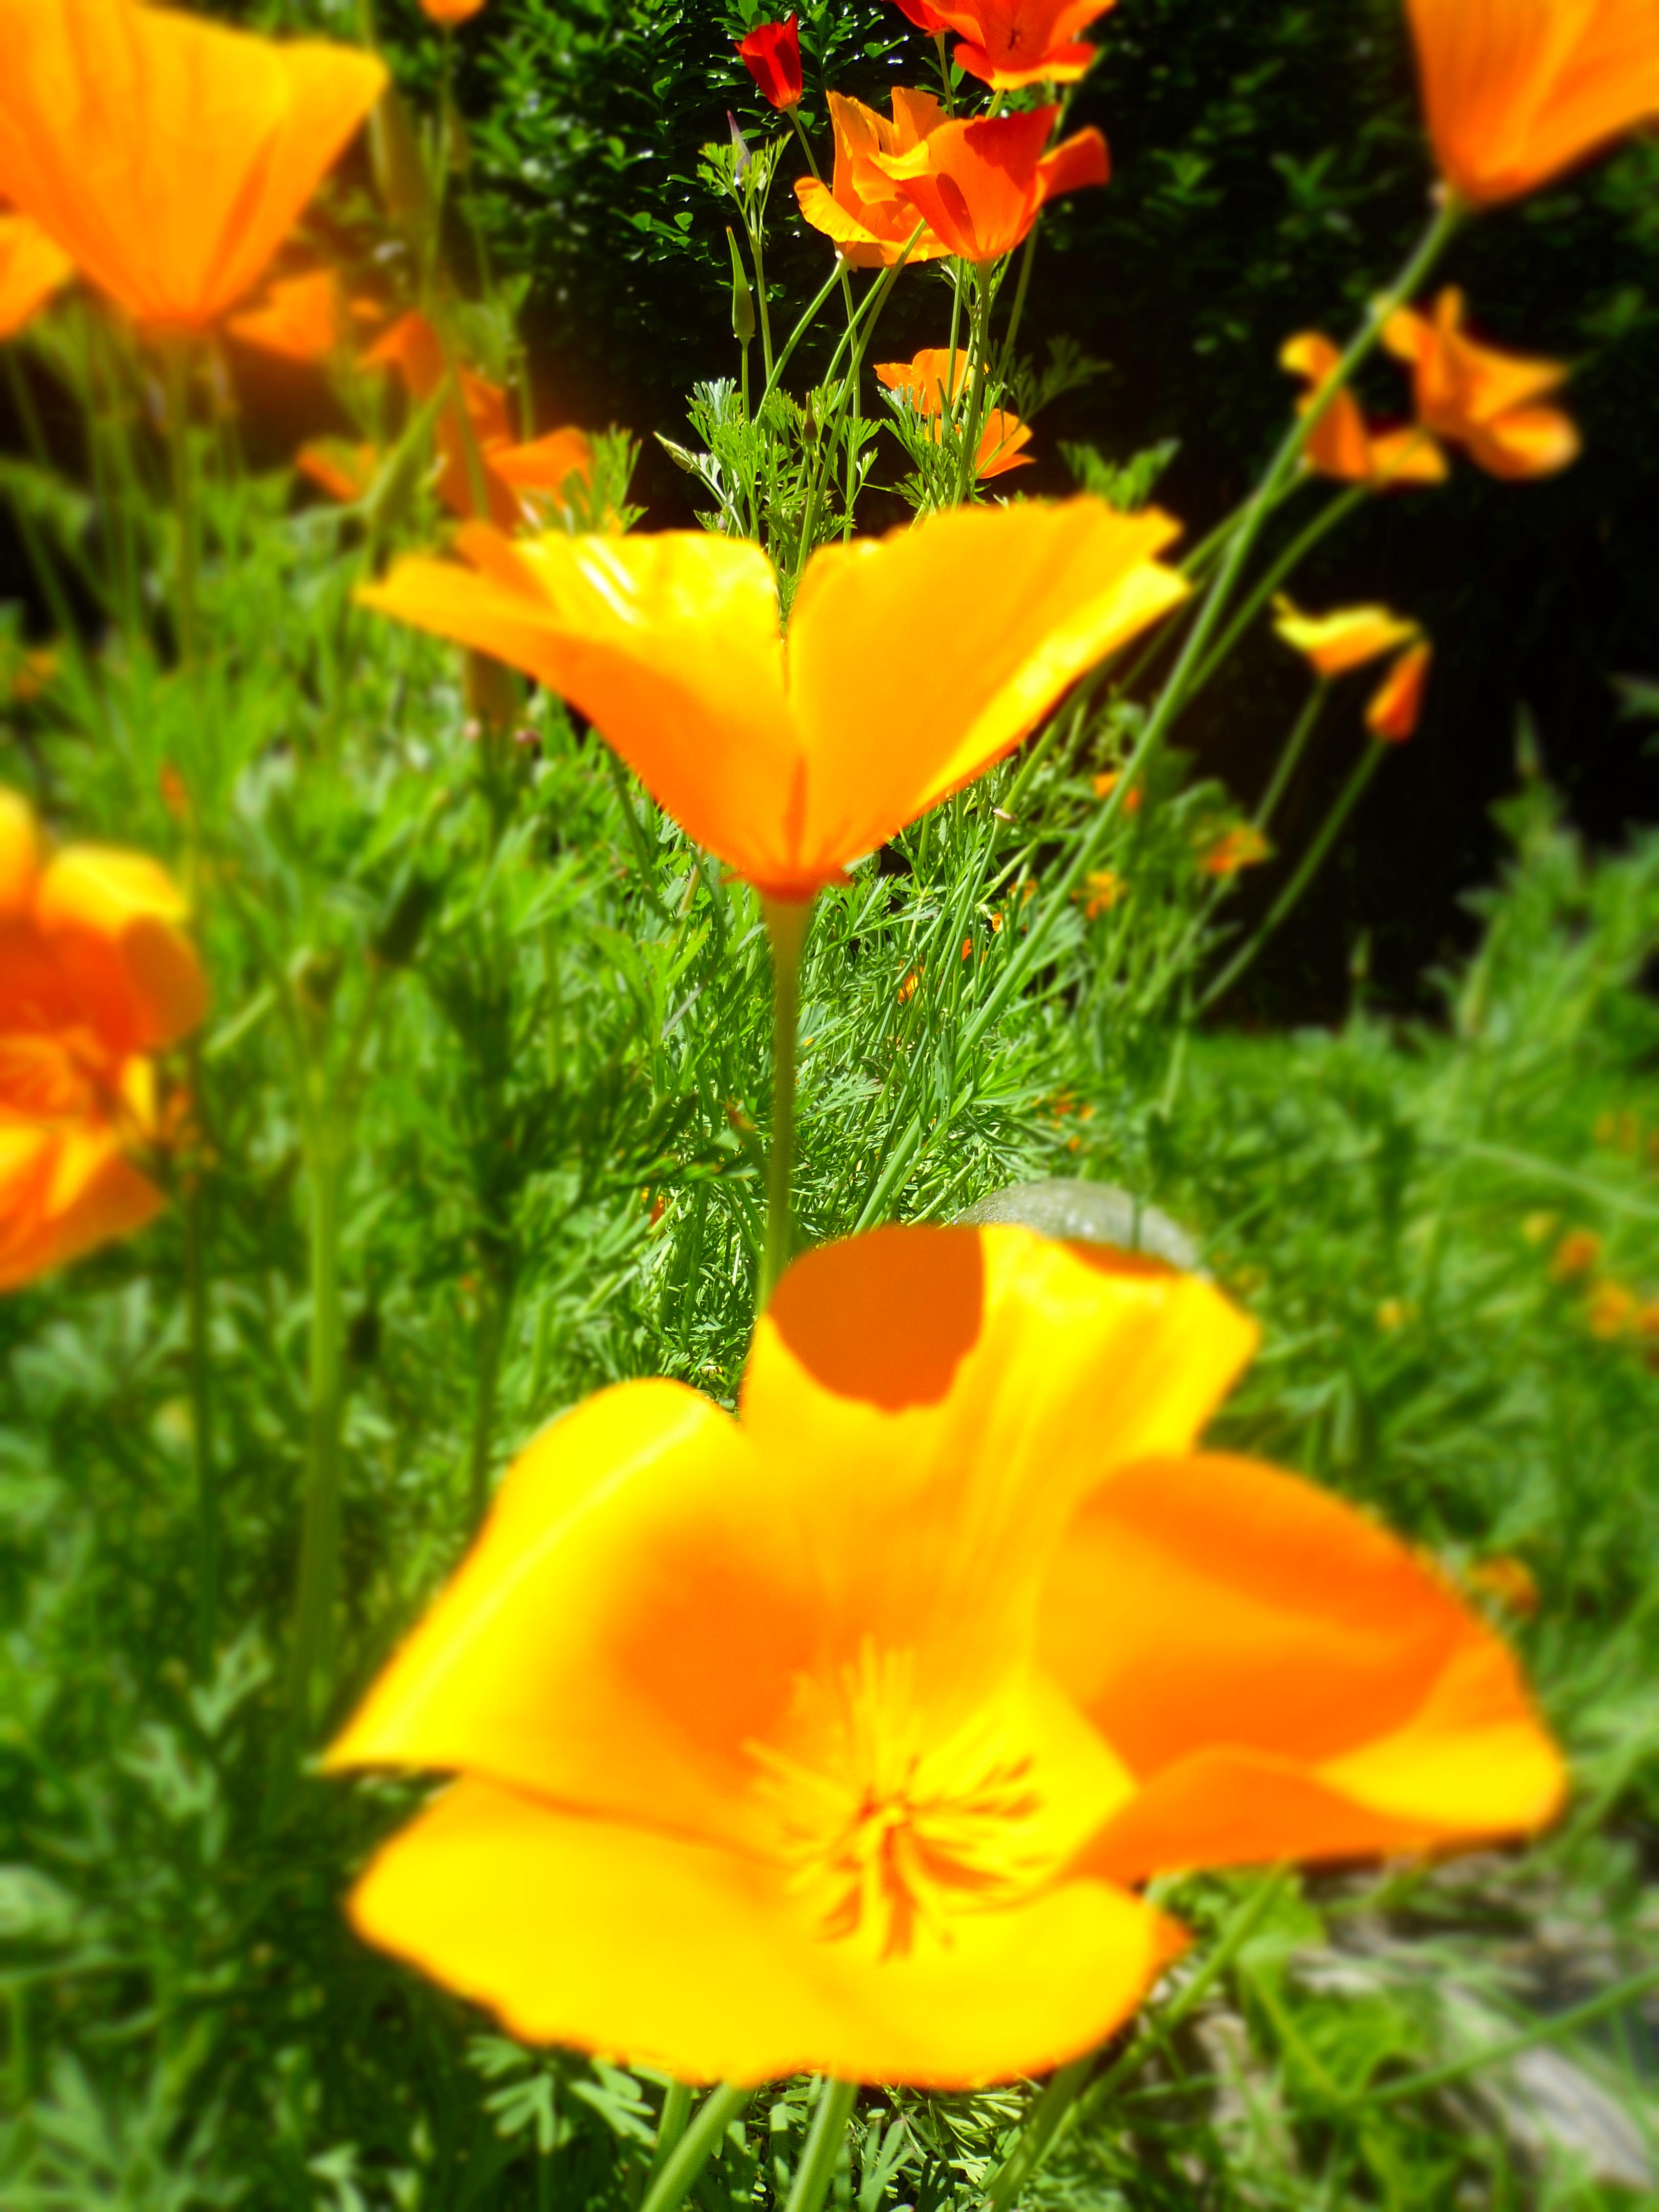 California Poppy in June Credit: N.L. McKinley